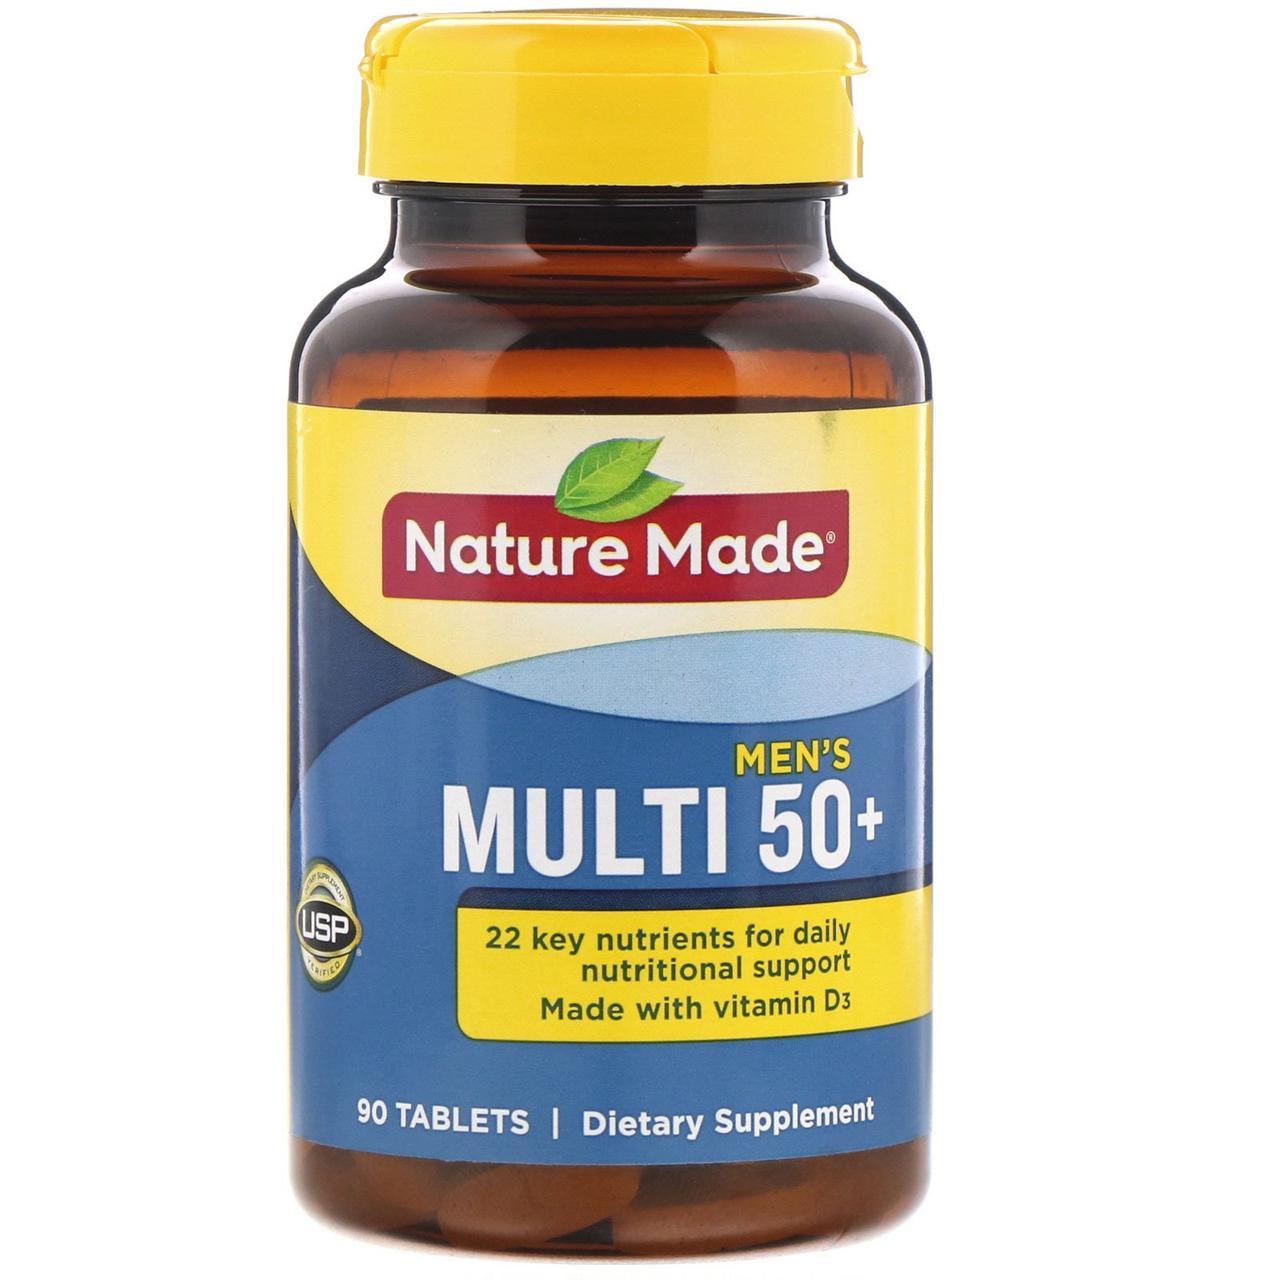 Мультивитамины для мужчин 50+, Multi For Him 50+, Nature Made, 90 табл.